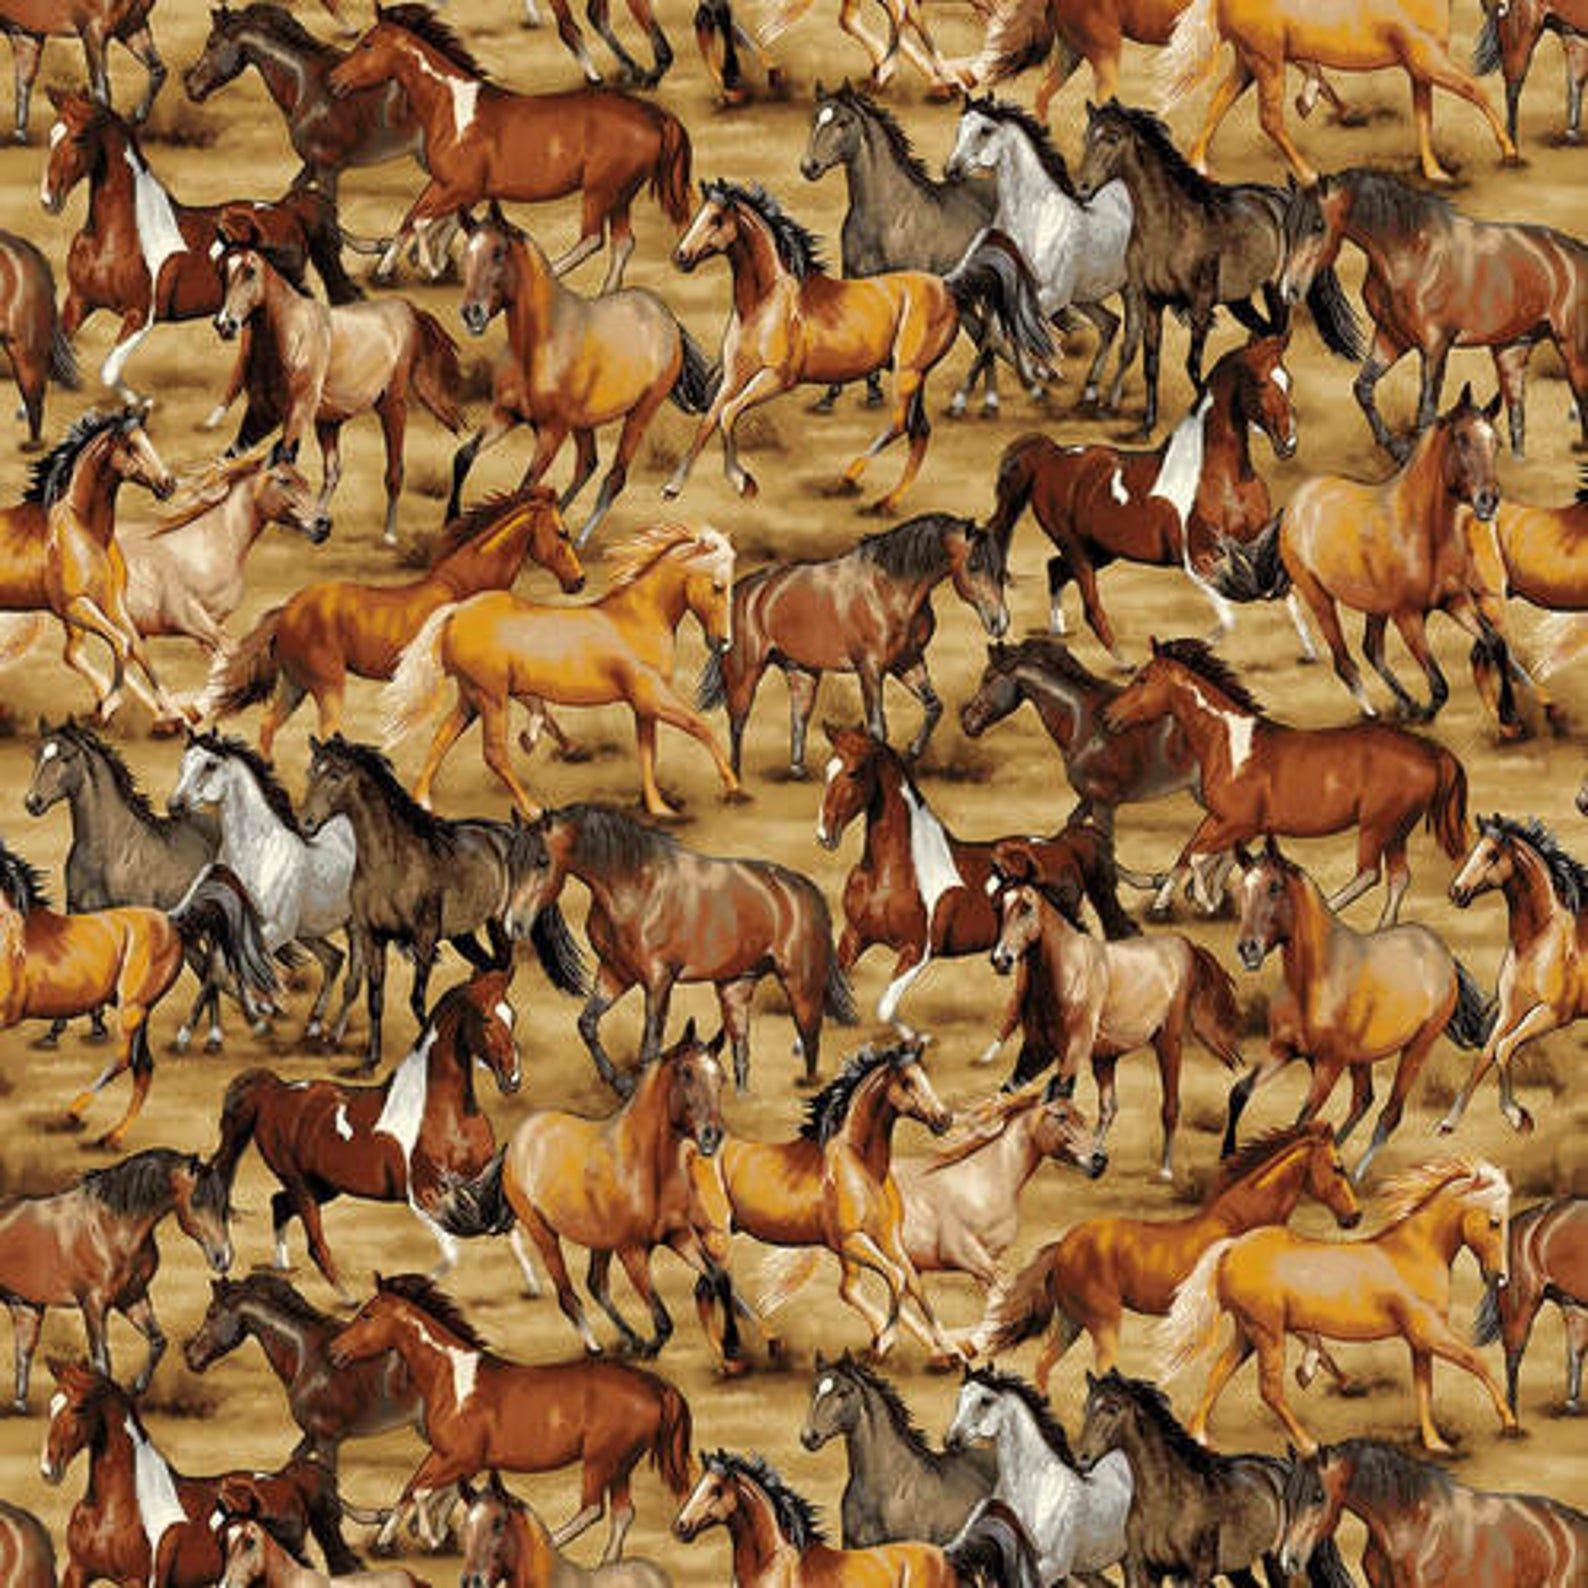 Benartex - Contempo - Wild Wild West Horses